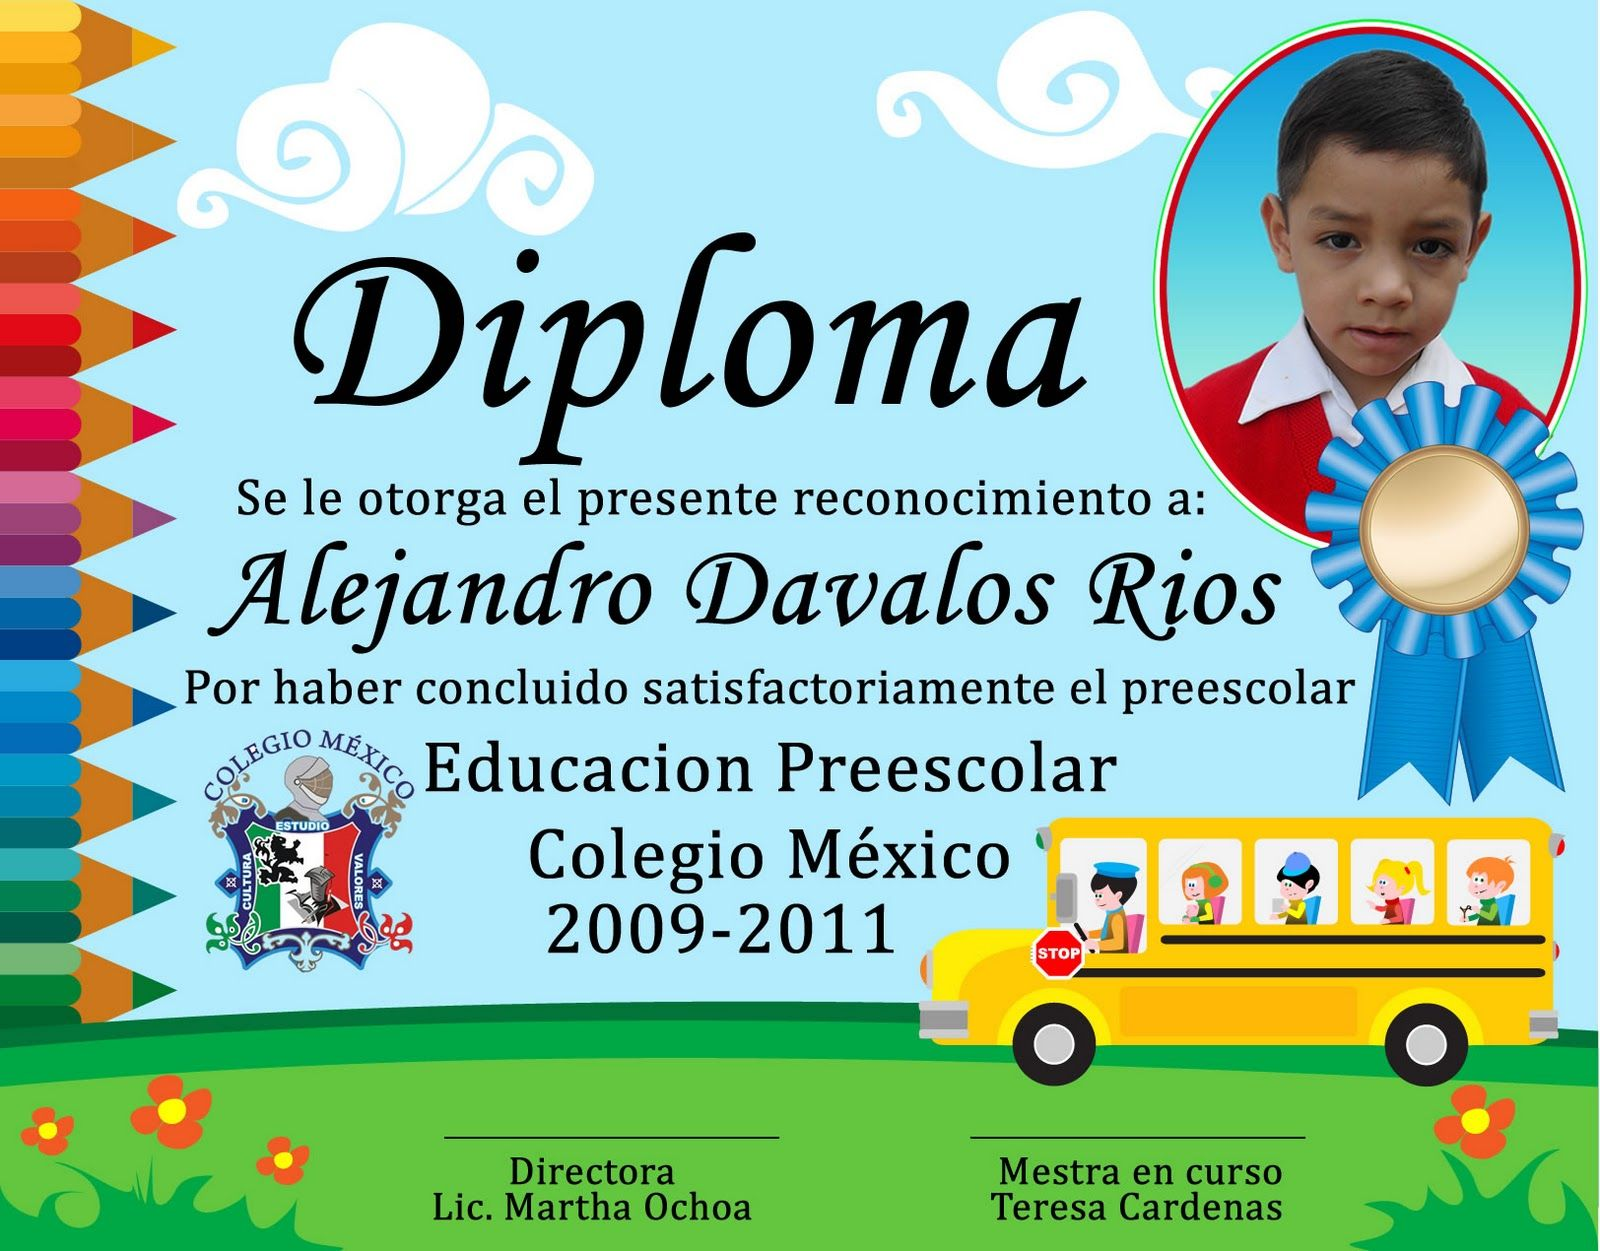 Diplomas para niños de kinder - Imagui Más | diplomas | Pinterest ...